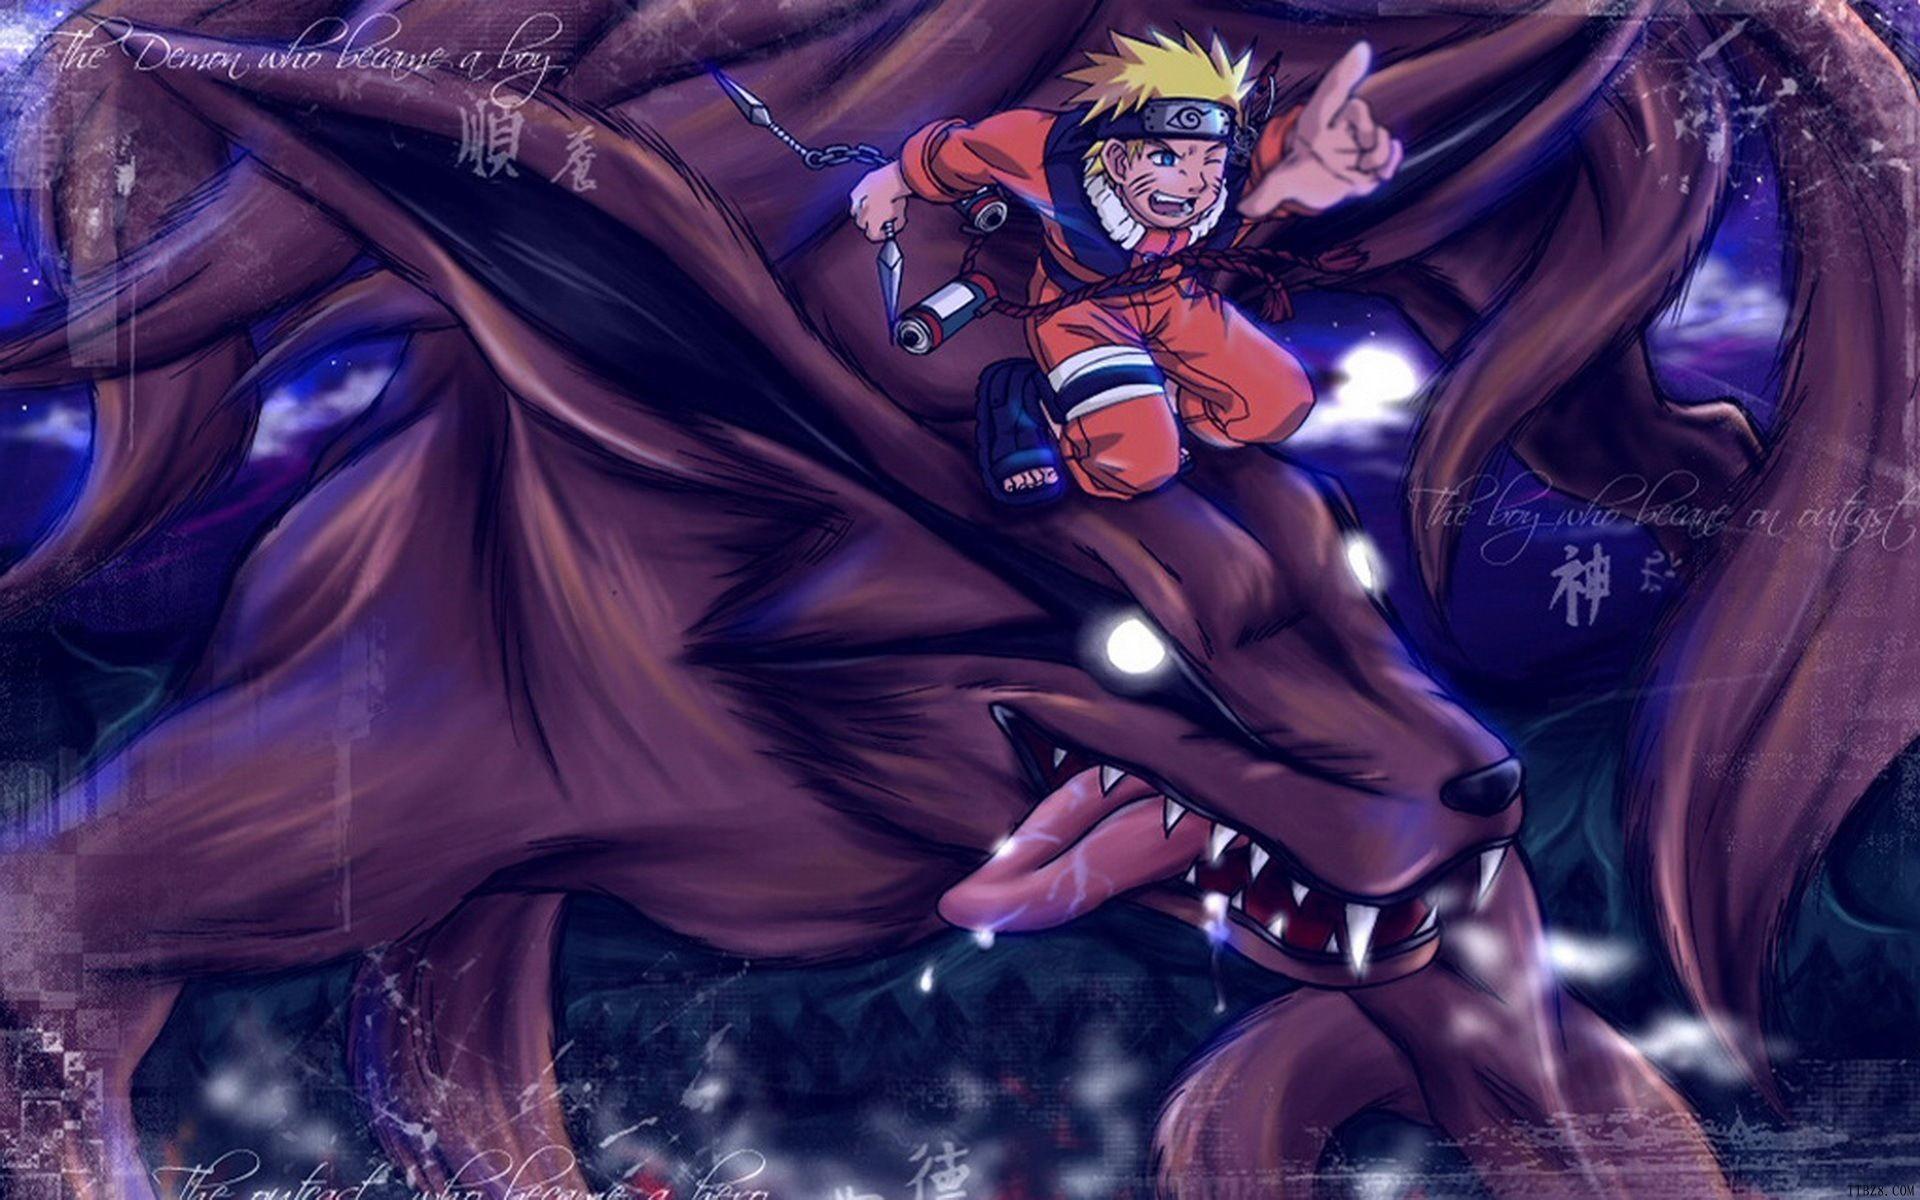 Naruto Vs Sasuke Free Wallpapers For Desktop HD Wallpaper Download 800×640  Naruto Free Wallpapers